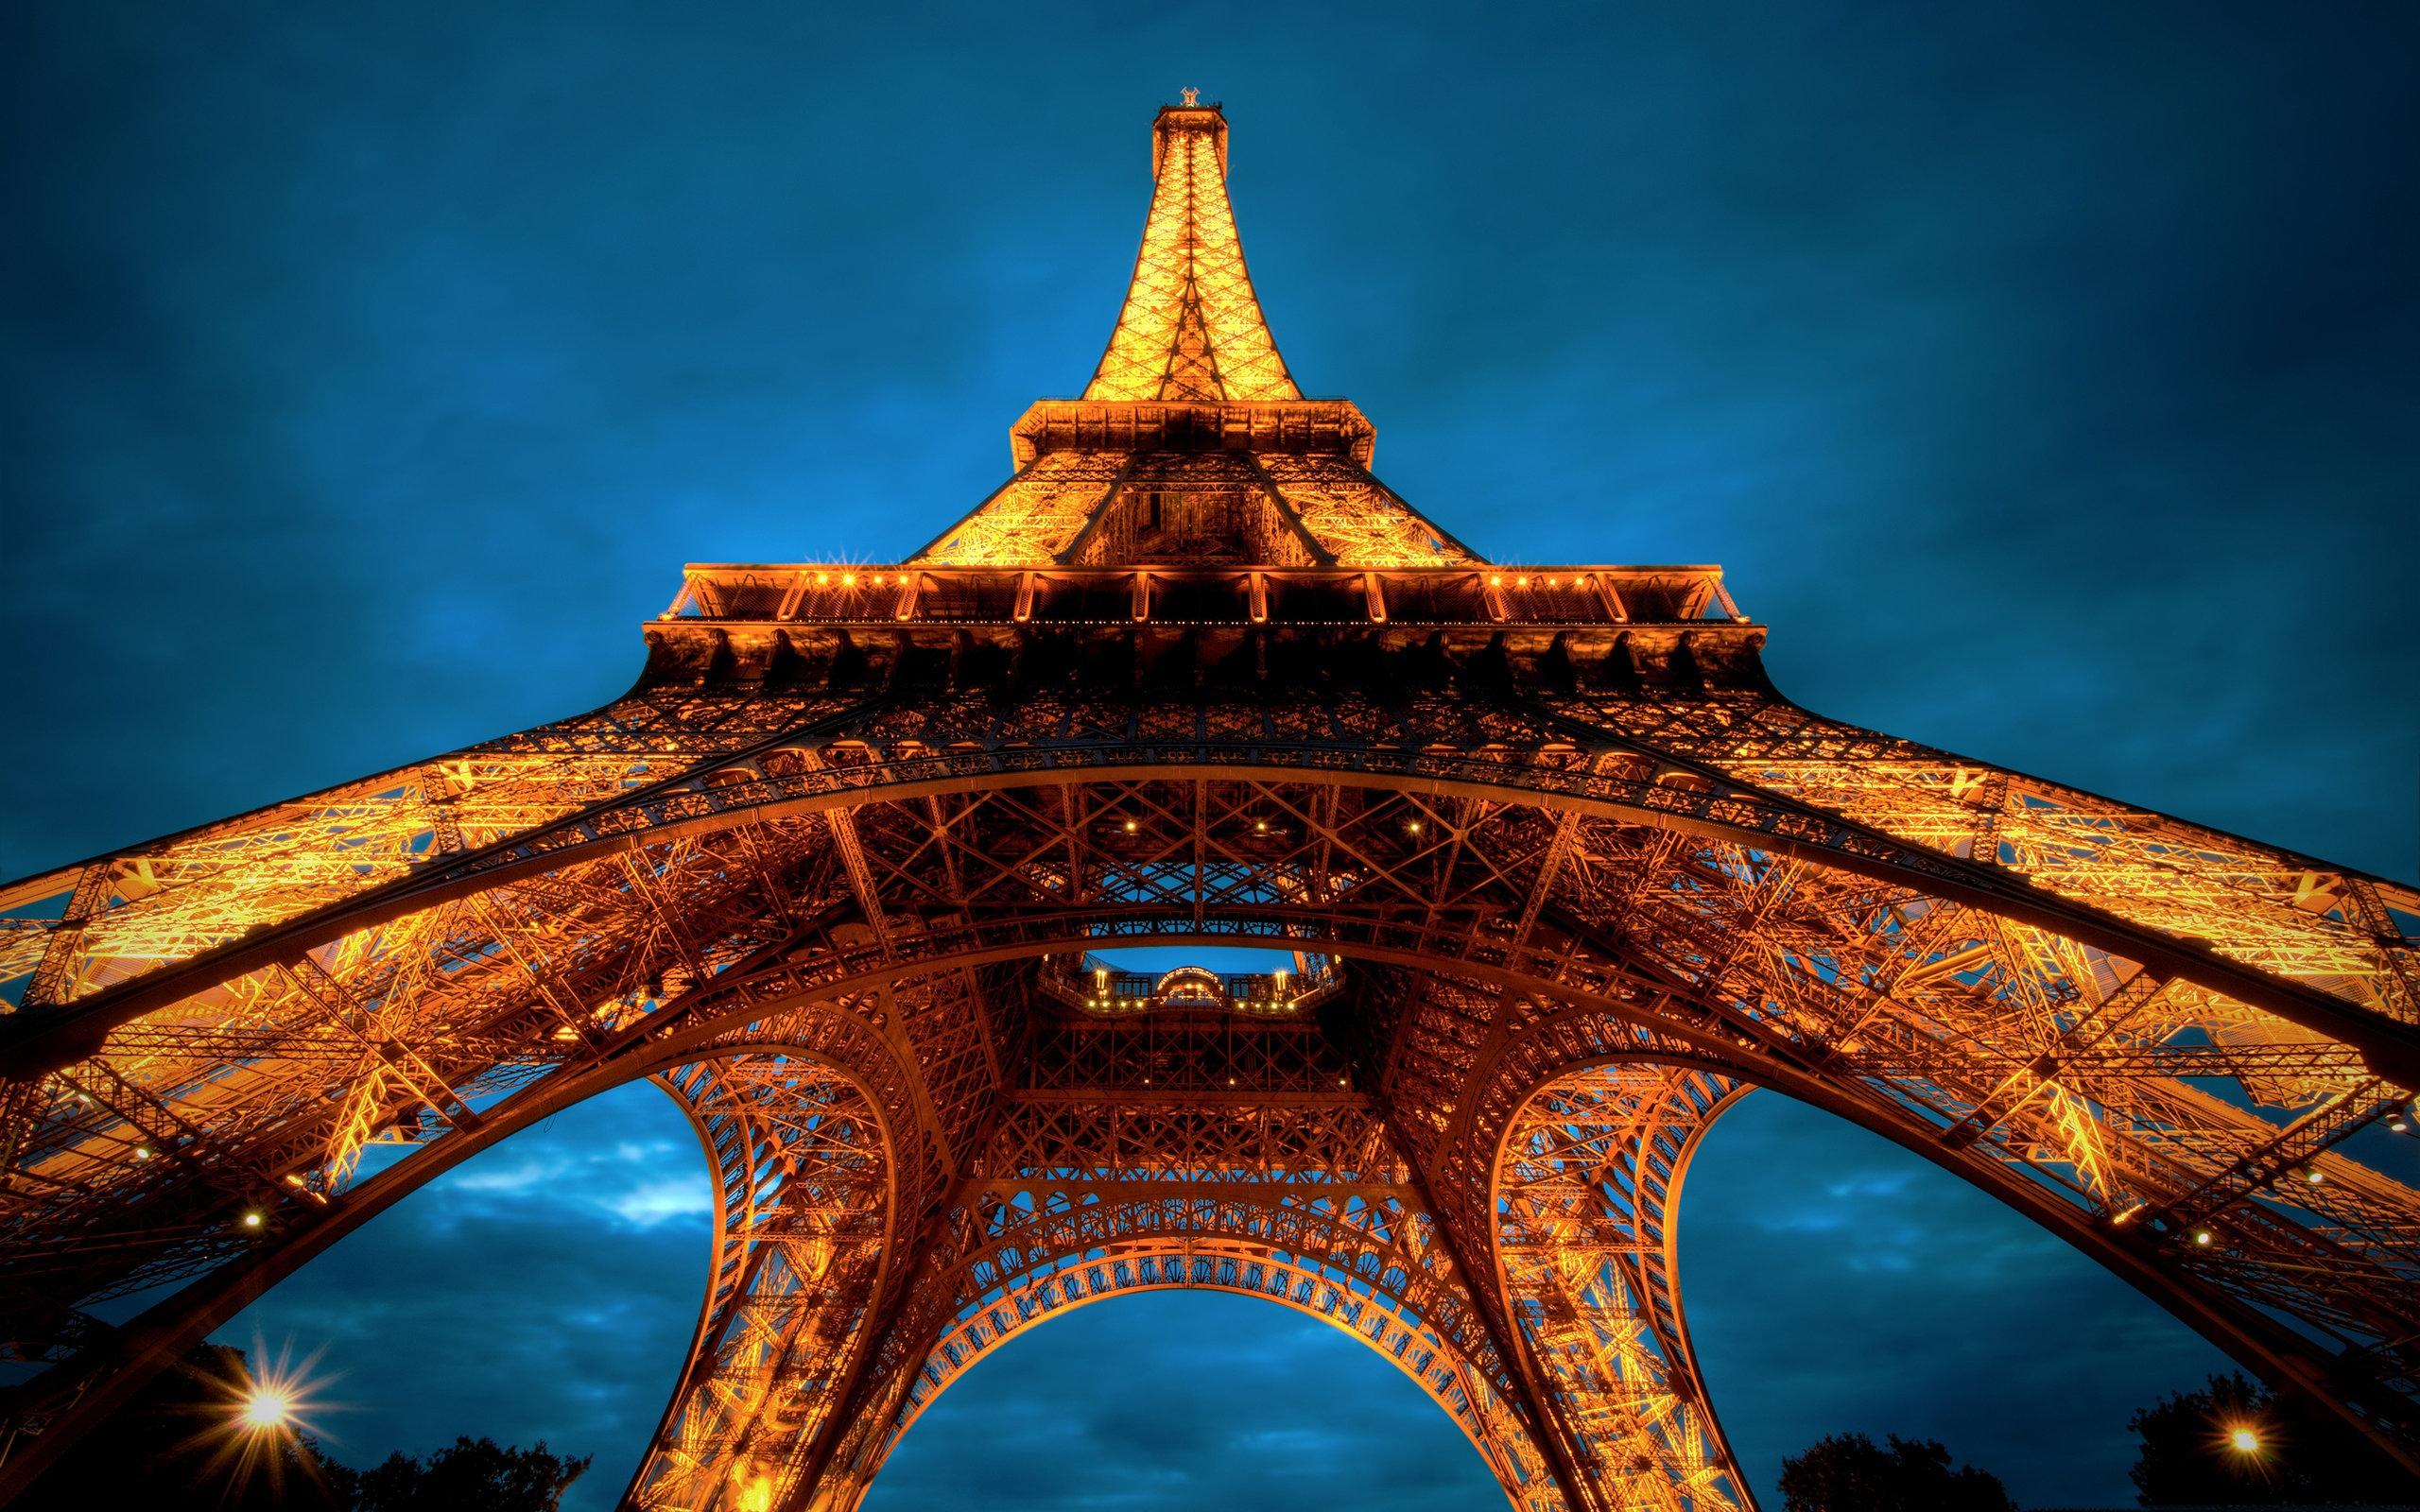 Attention Grabbing Hd Wallpaper Eiffel Tower 1444752 Hd